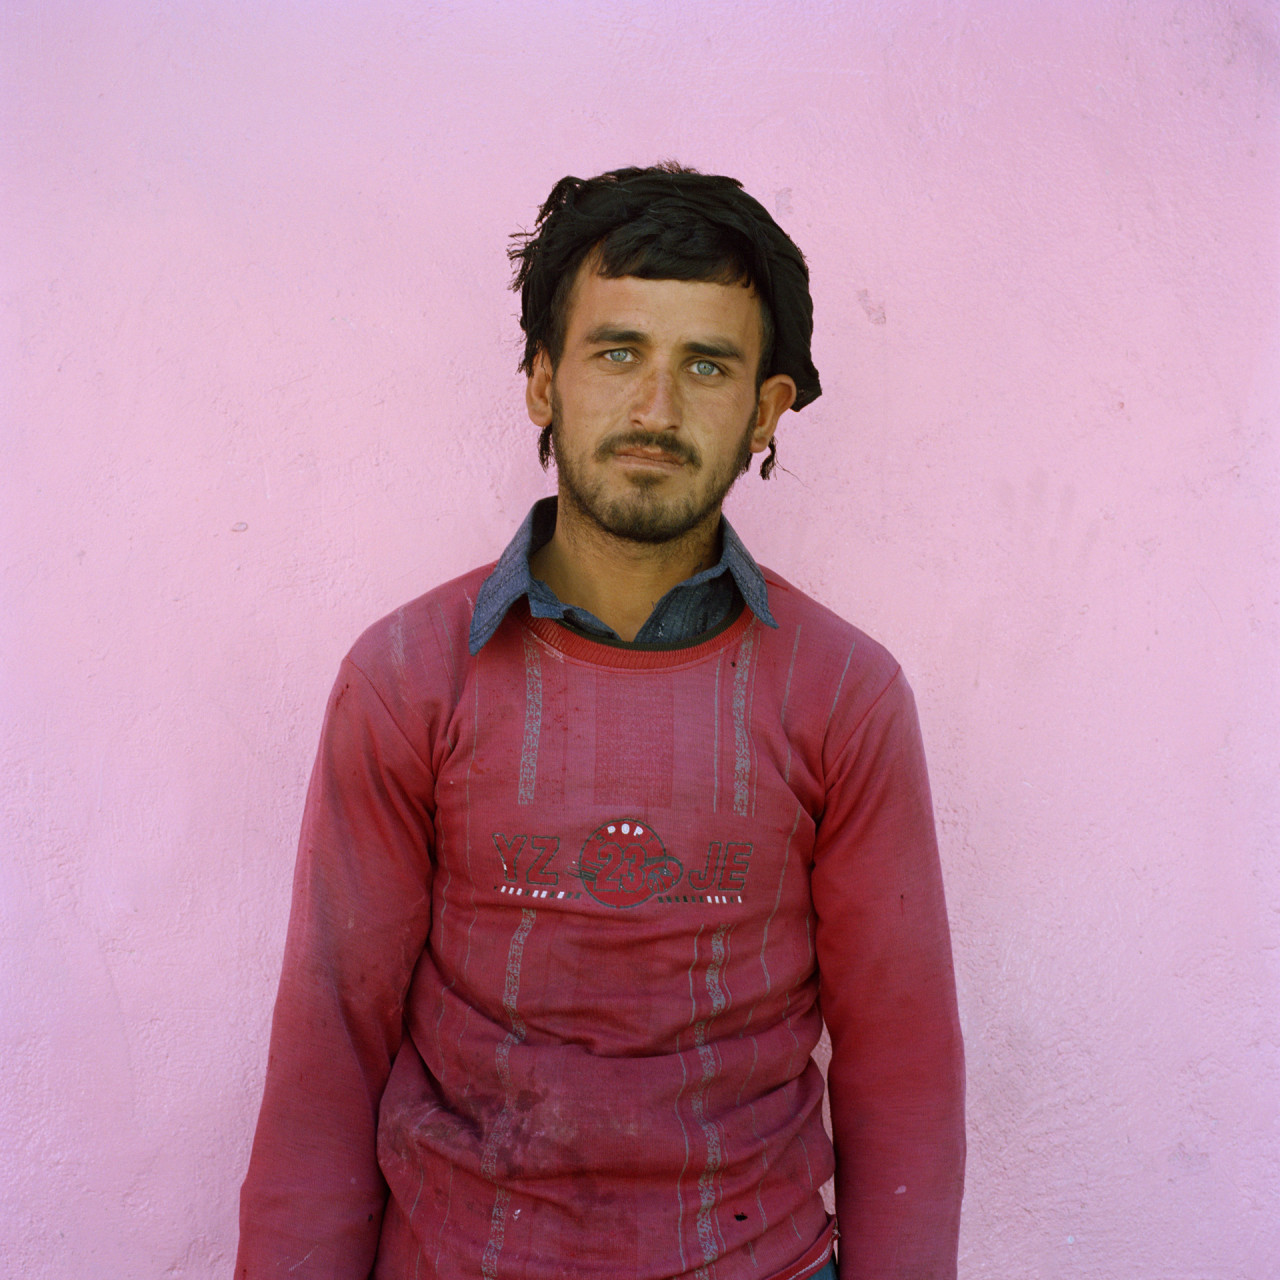 Afghan man pink wall